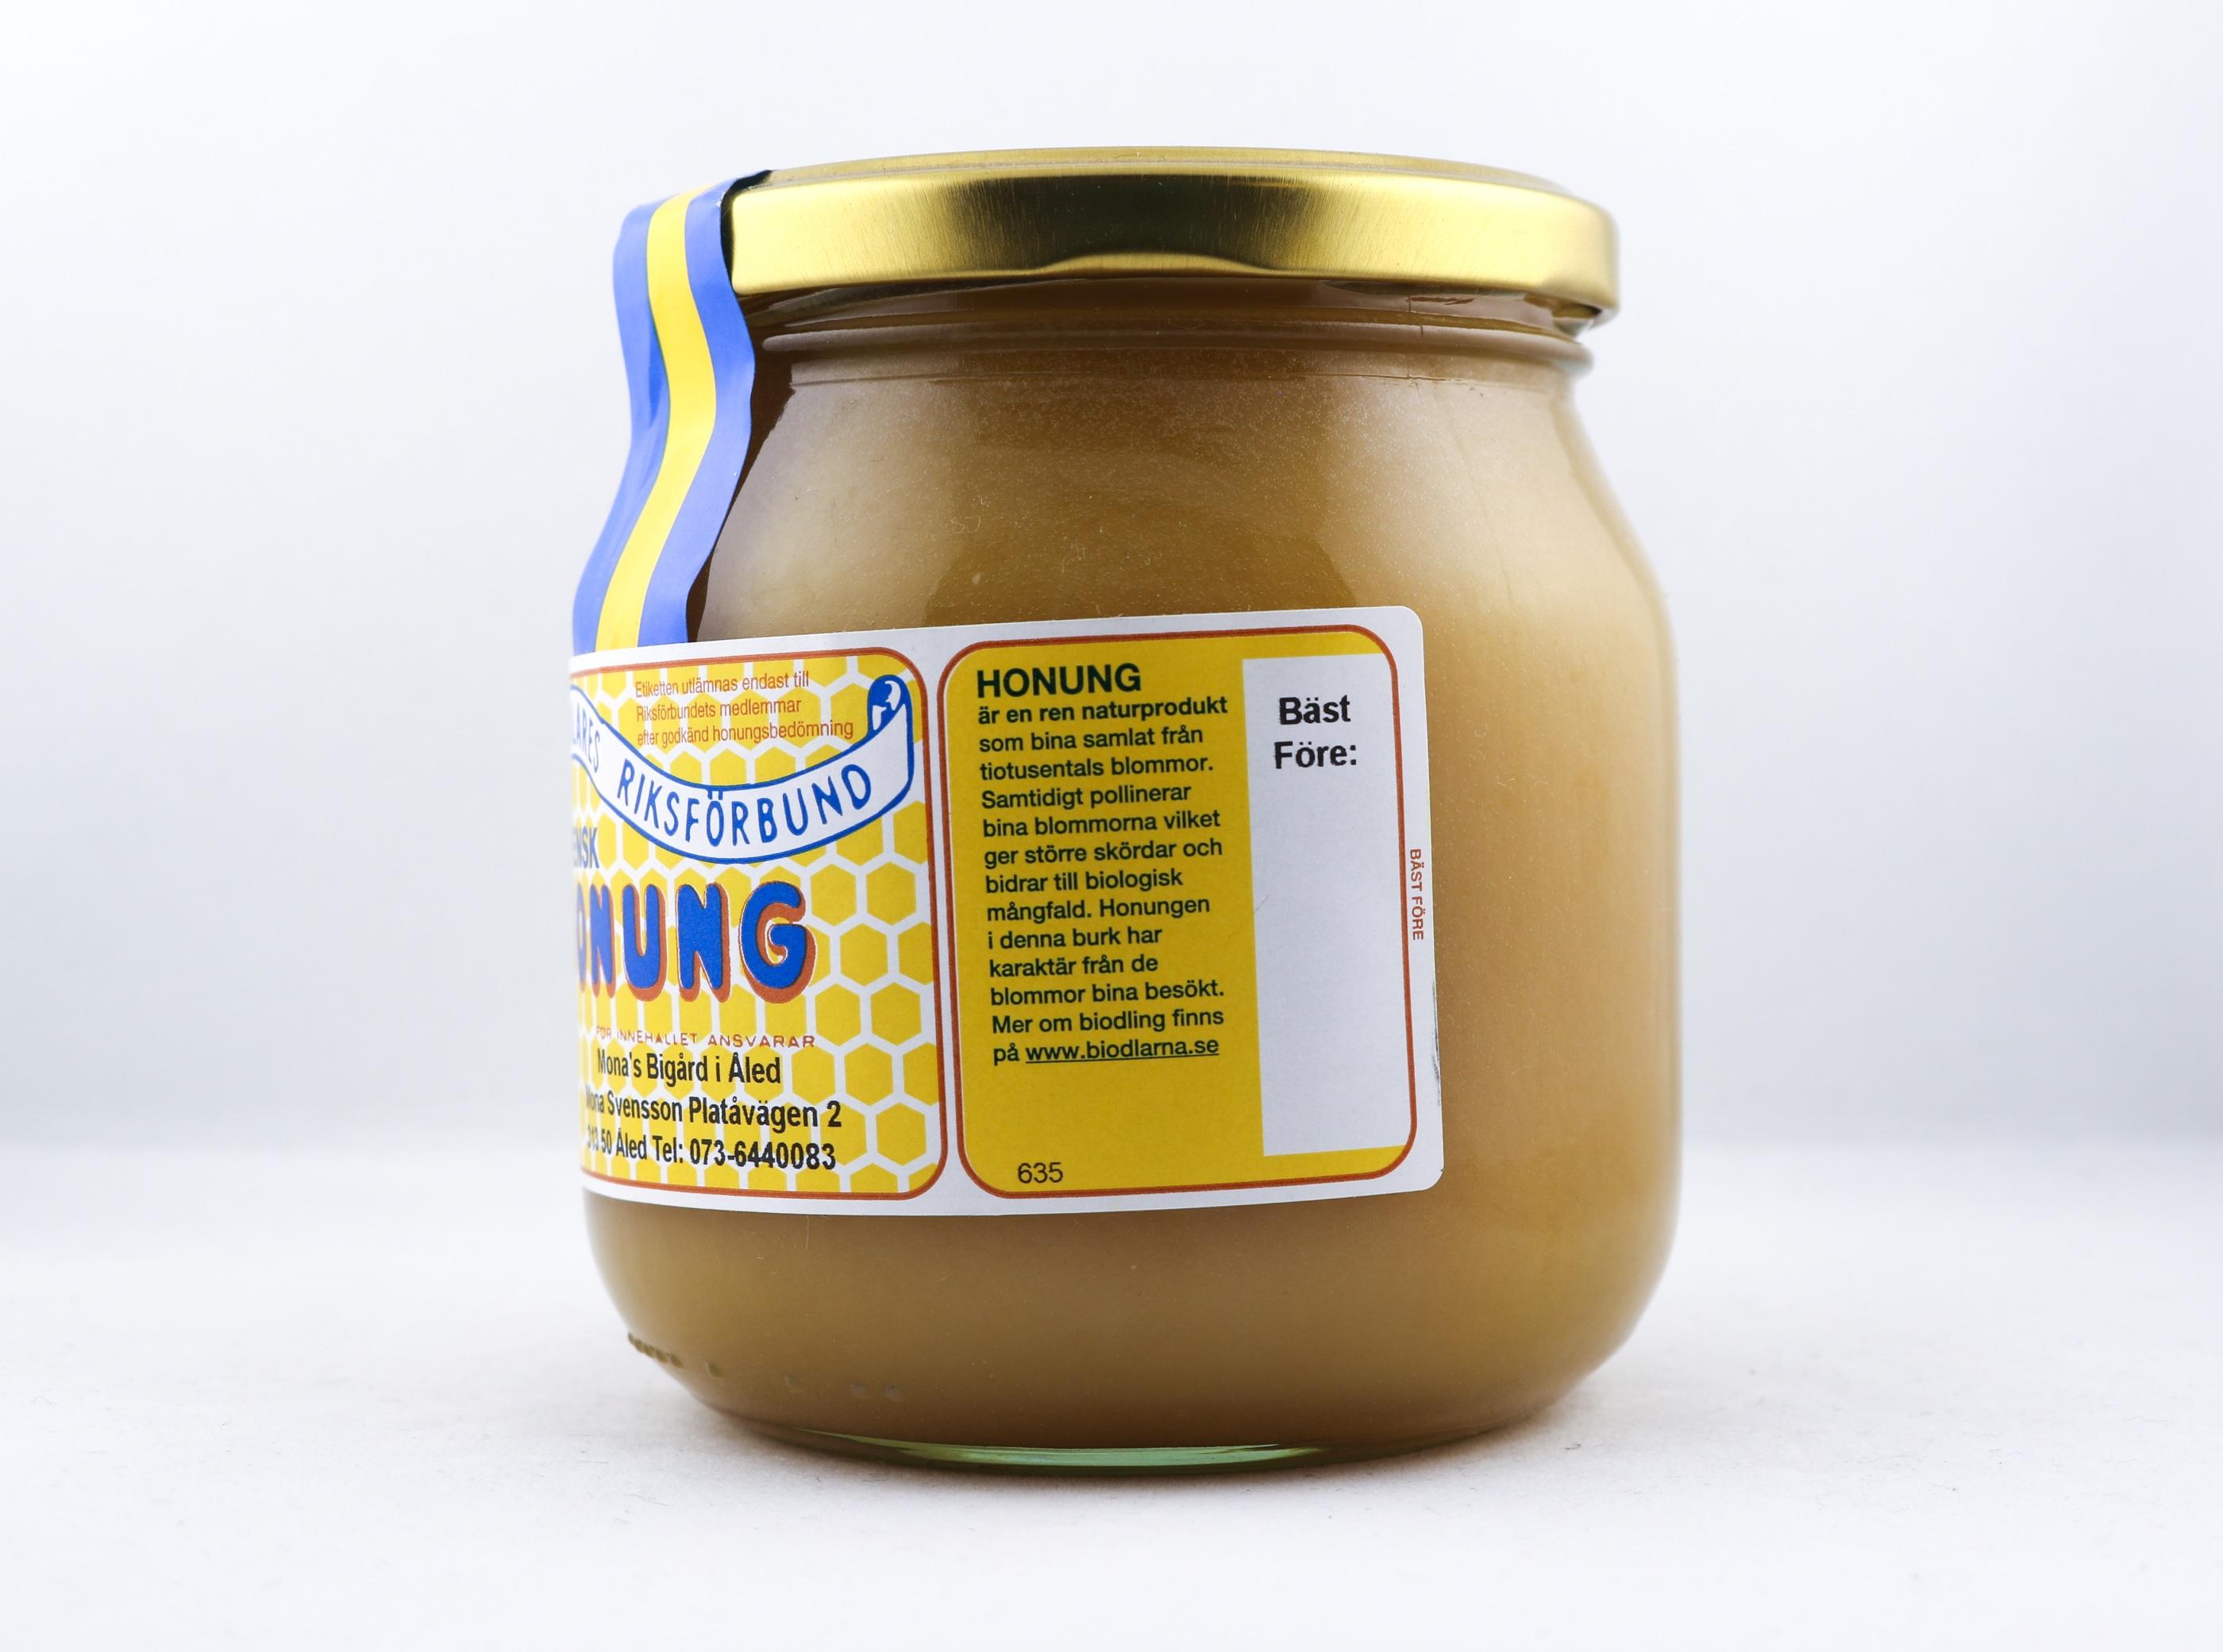 Svensk Honung  Ljung Wellness Ayurveda Halmstadmassören Halmstad Sverige Sweden svensk sött mat eko ekologisk